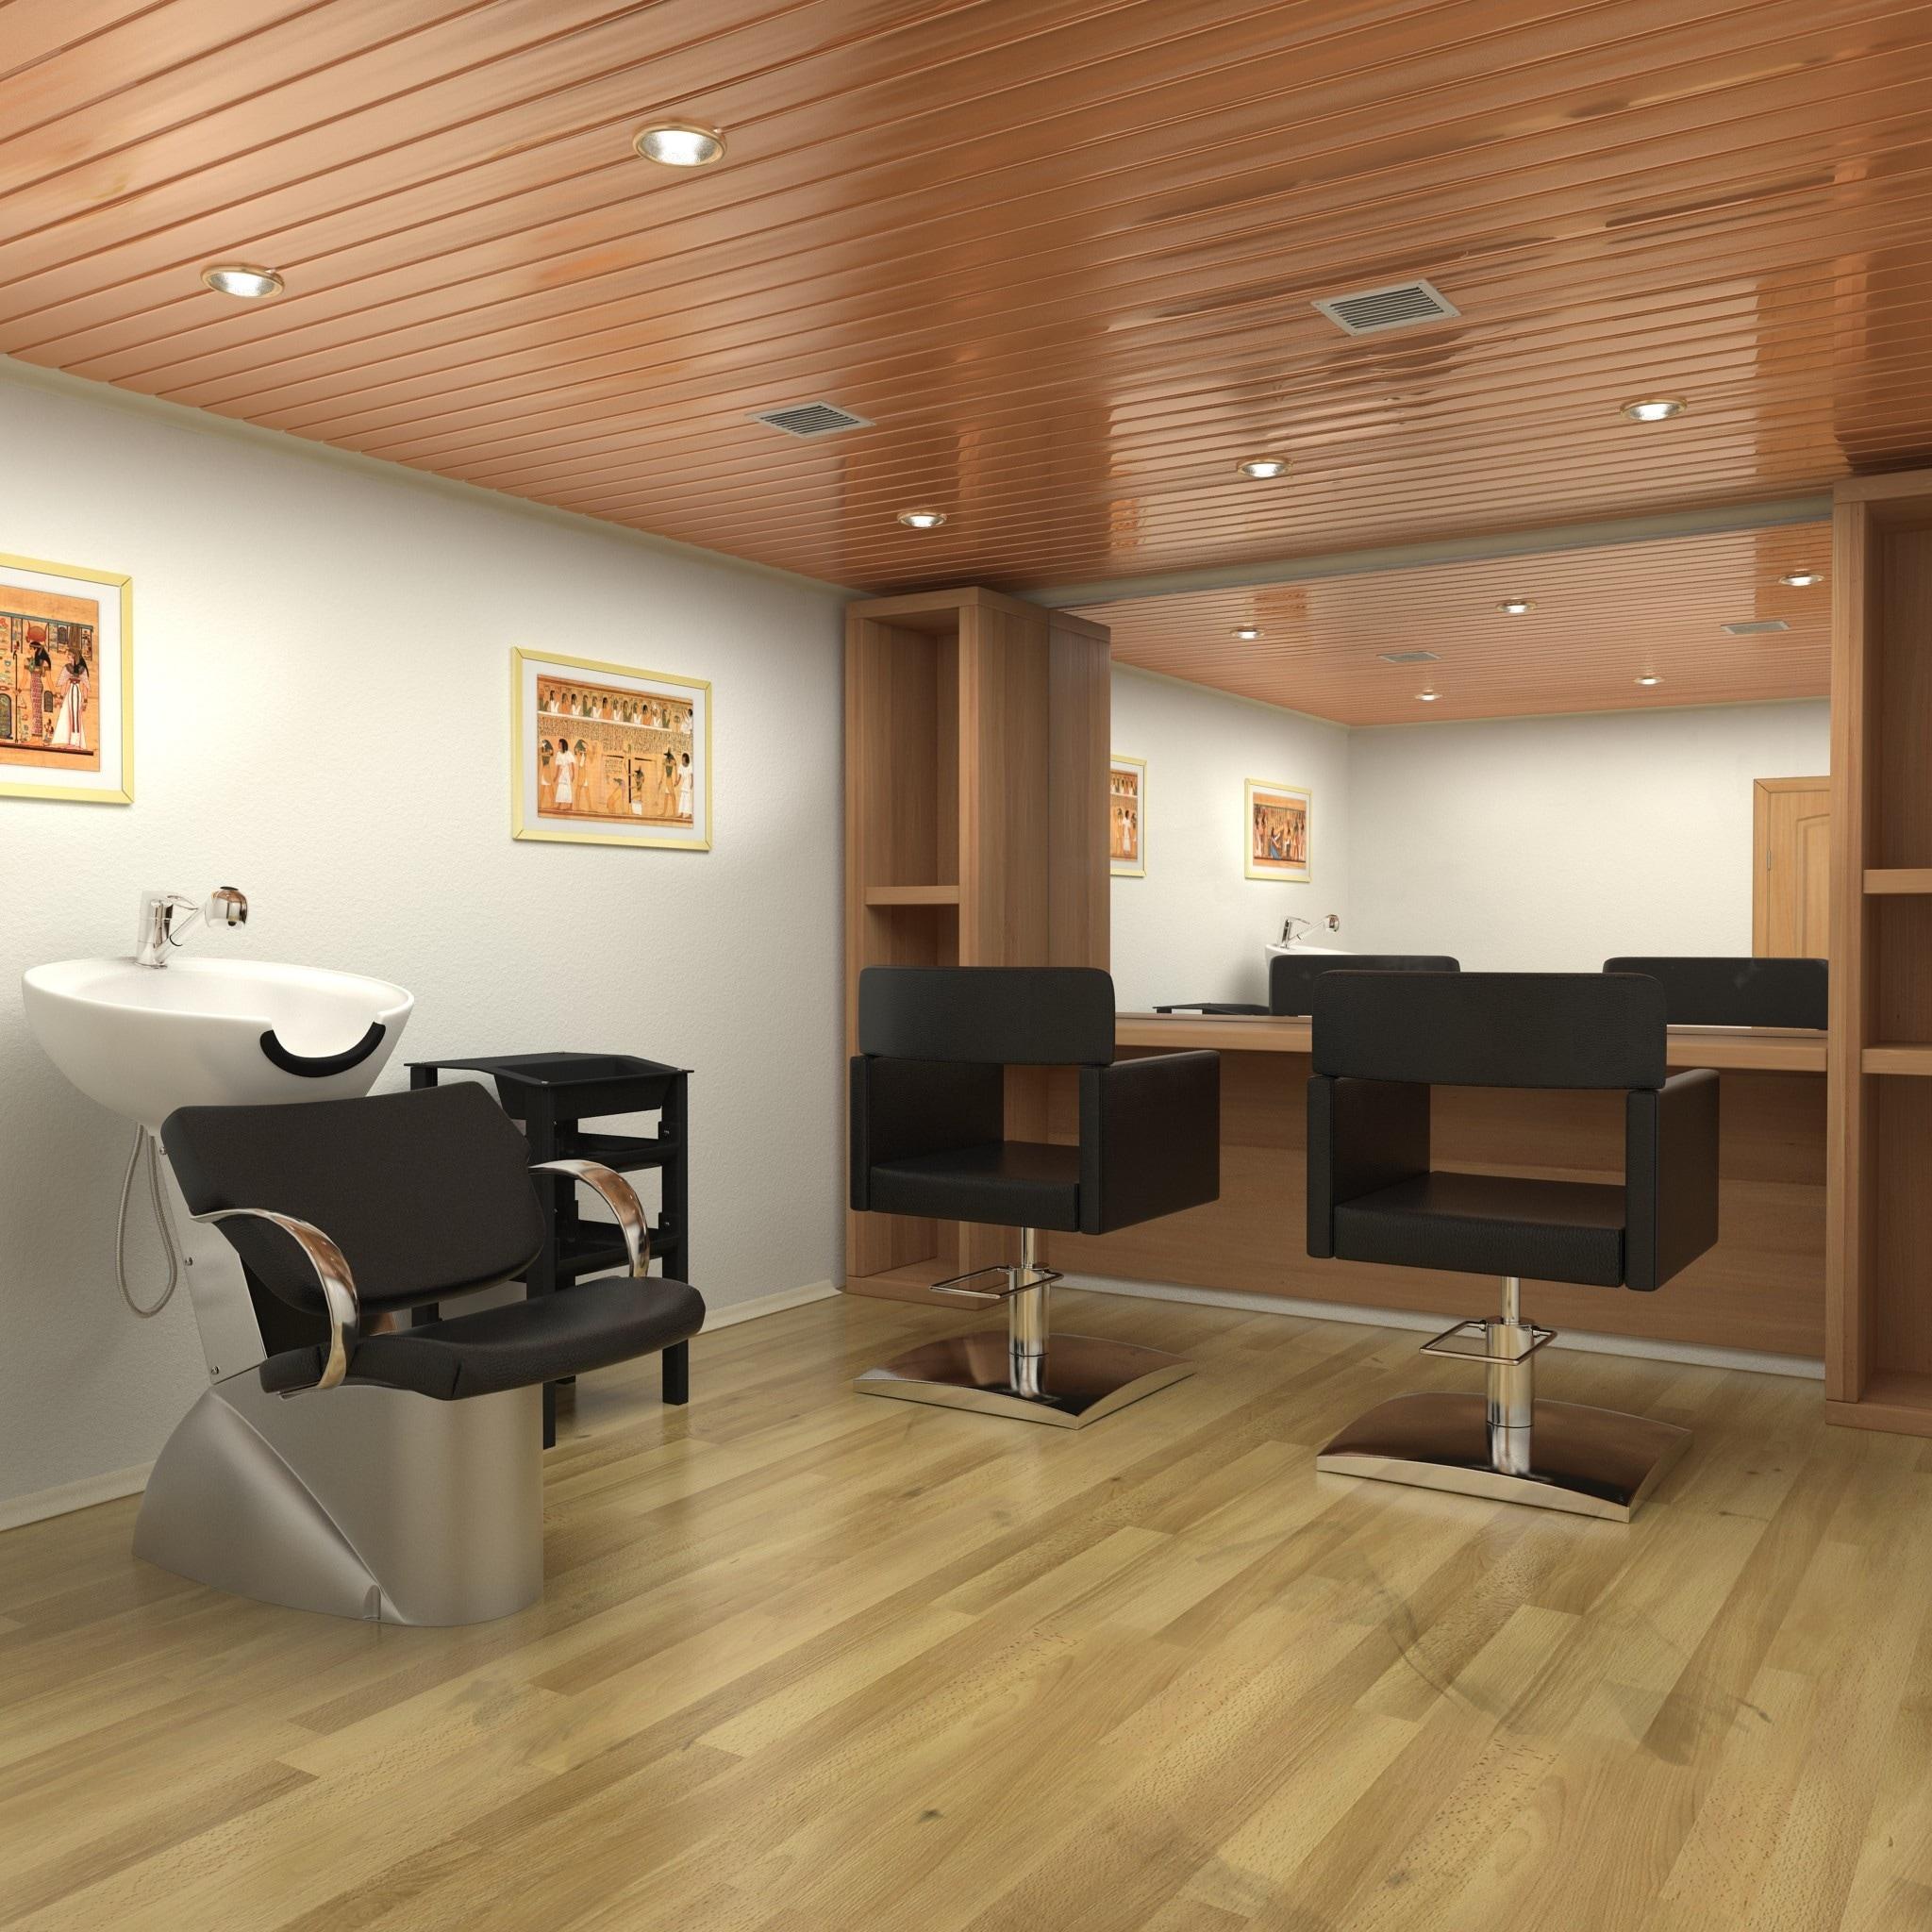 3d hair salon for 3d salon design software